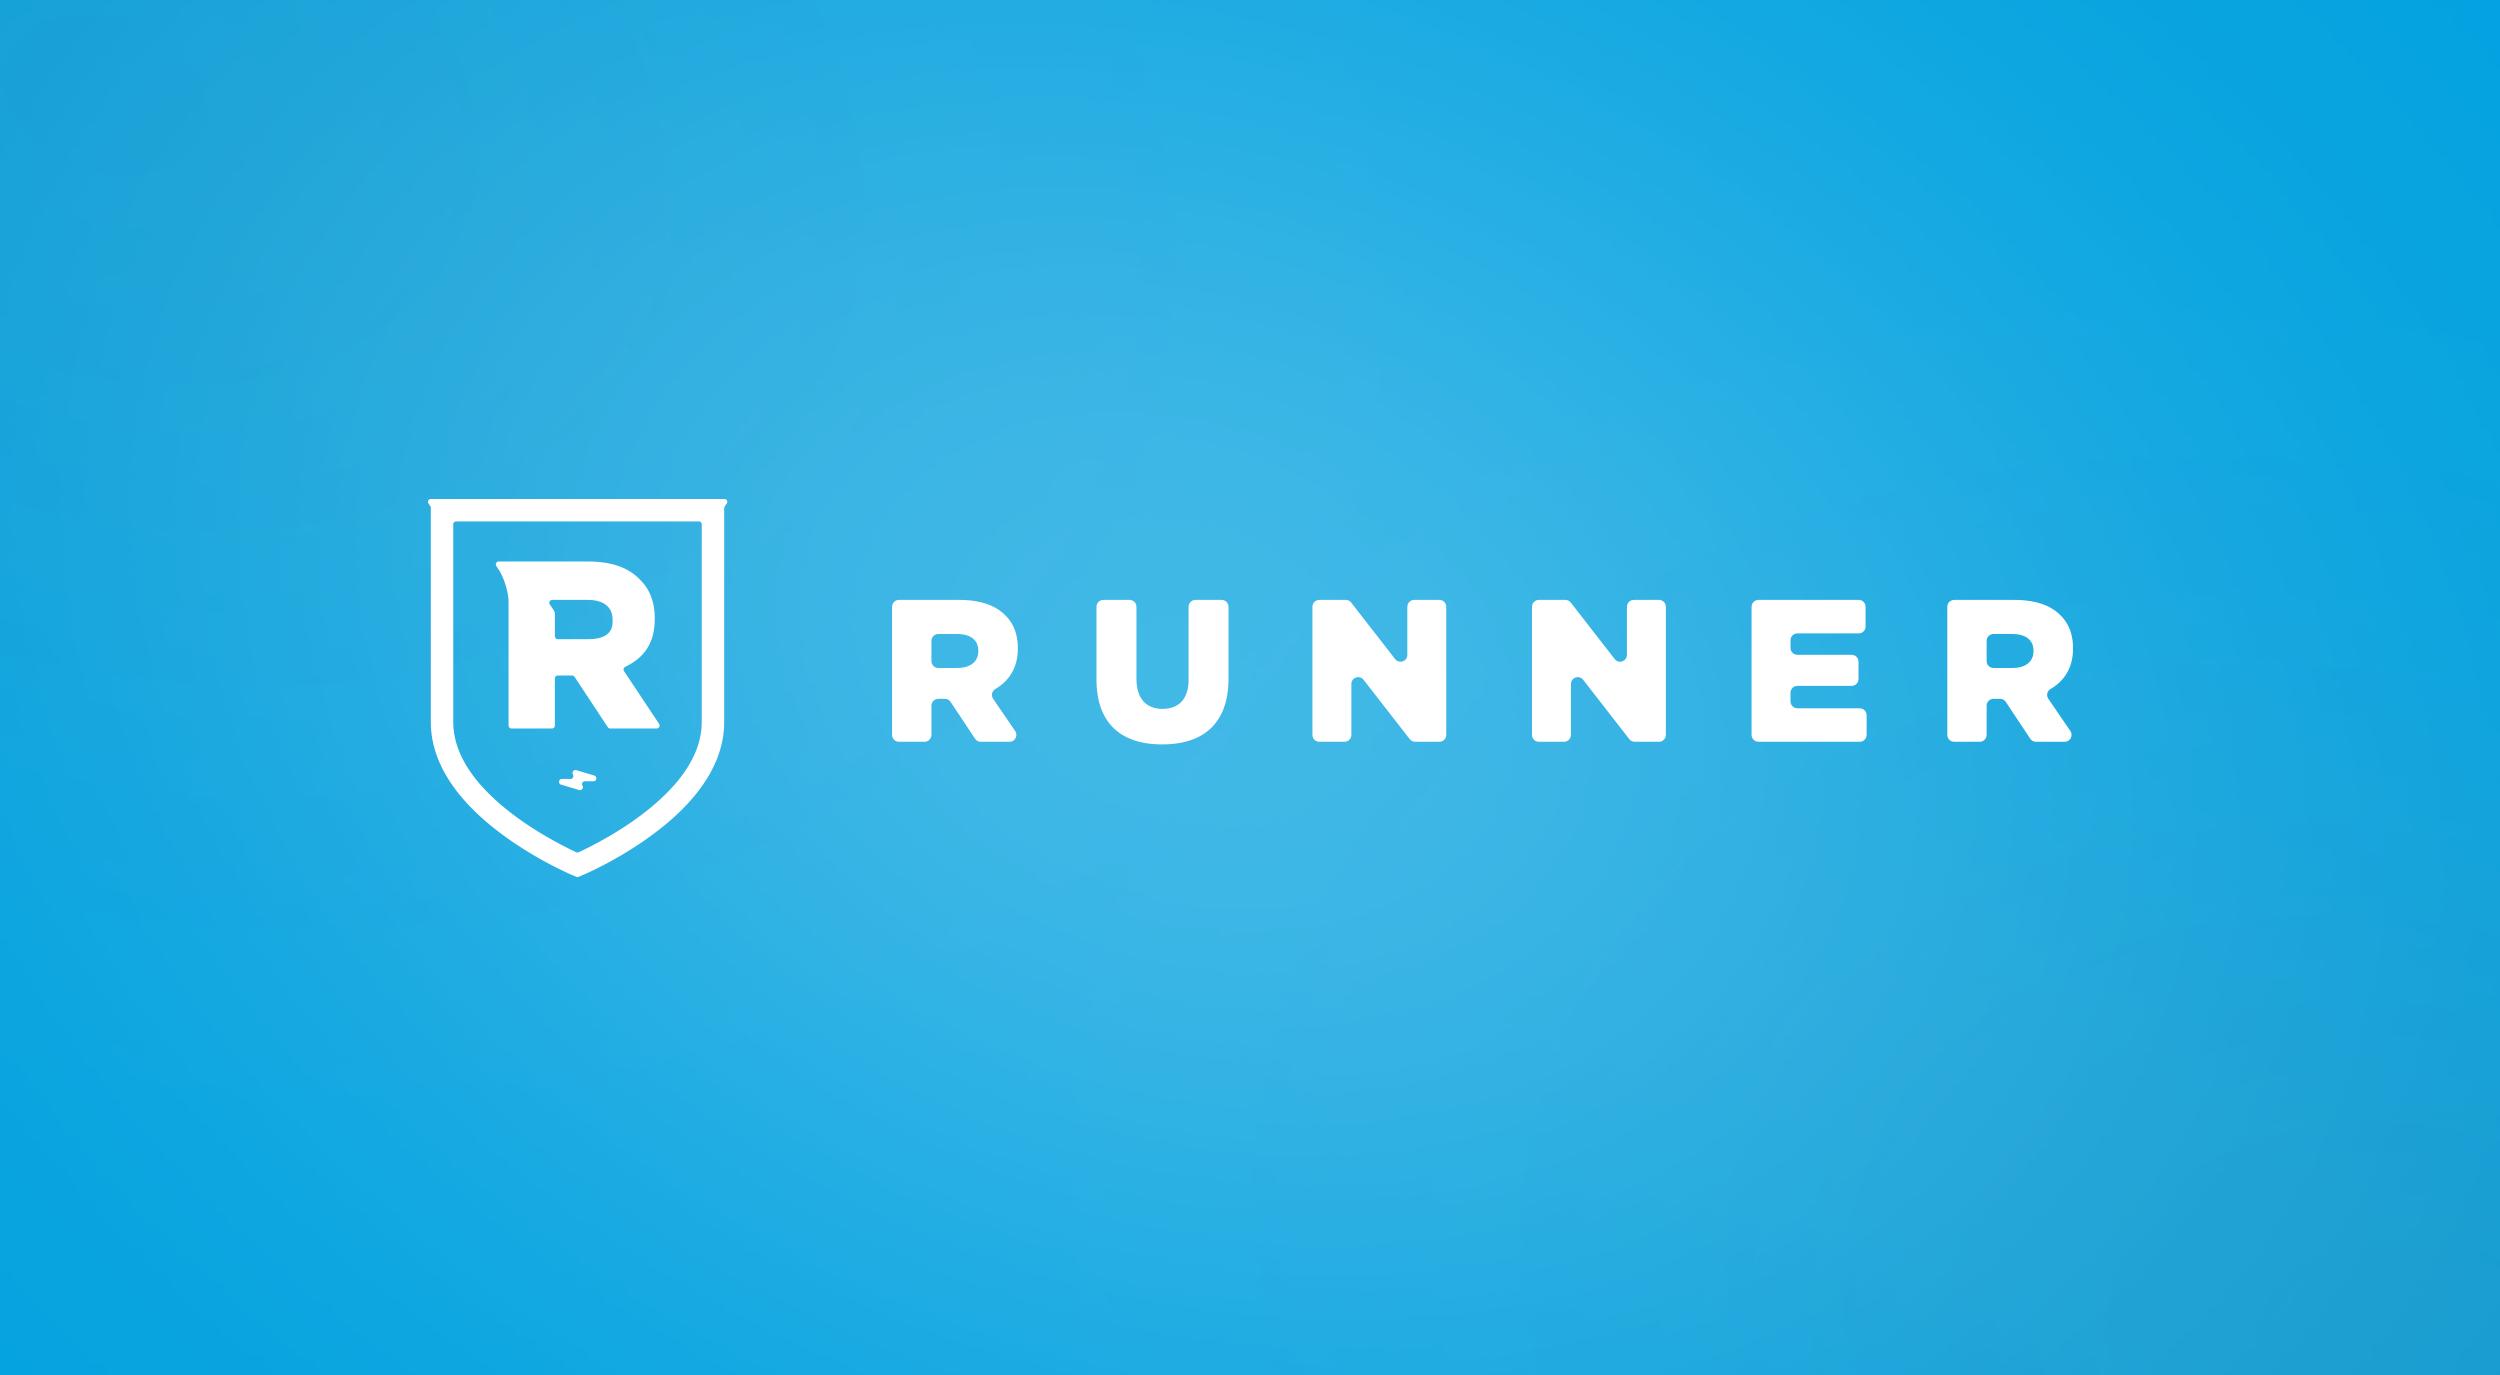 Runner_logo_CarlosMenchaca